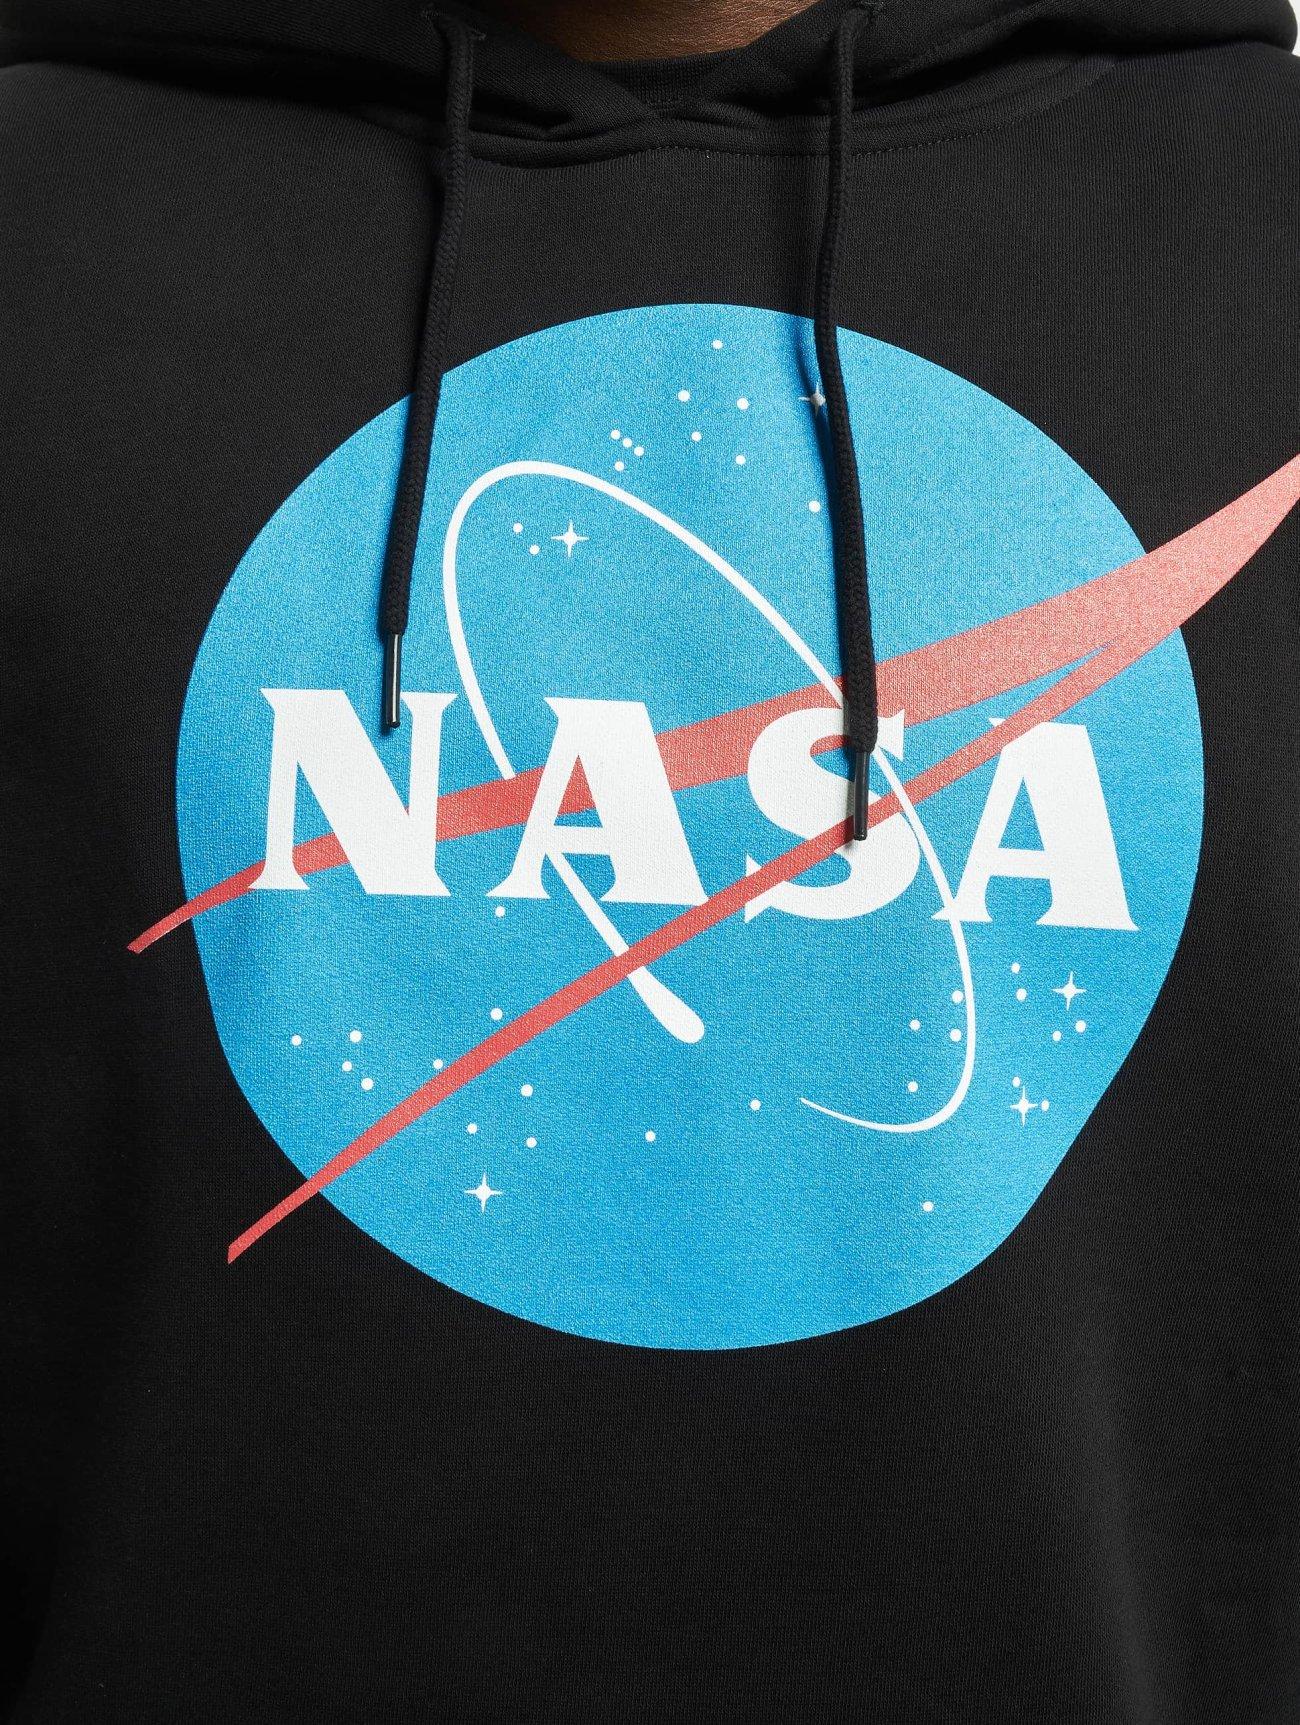 Mister Tee   NASA noir Homme Sweat capuche 429838  Homme Hauts